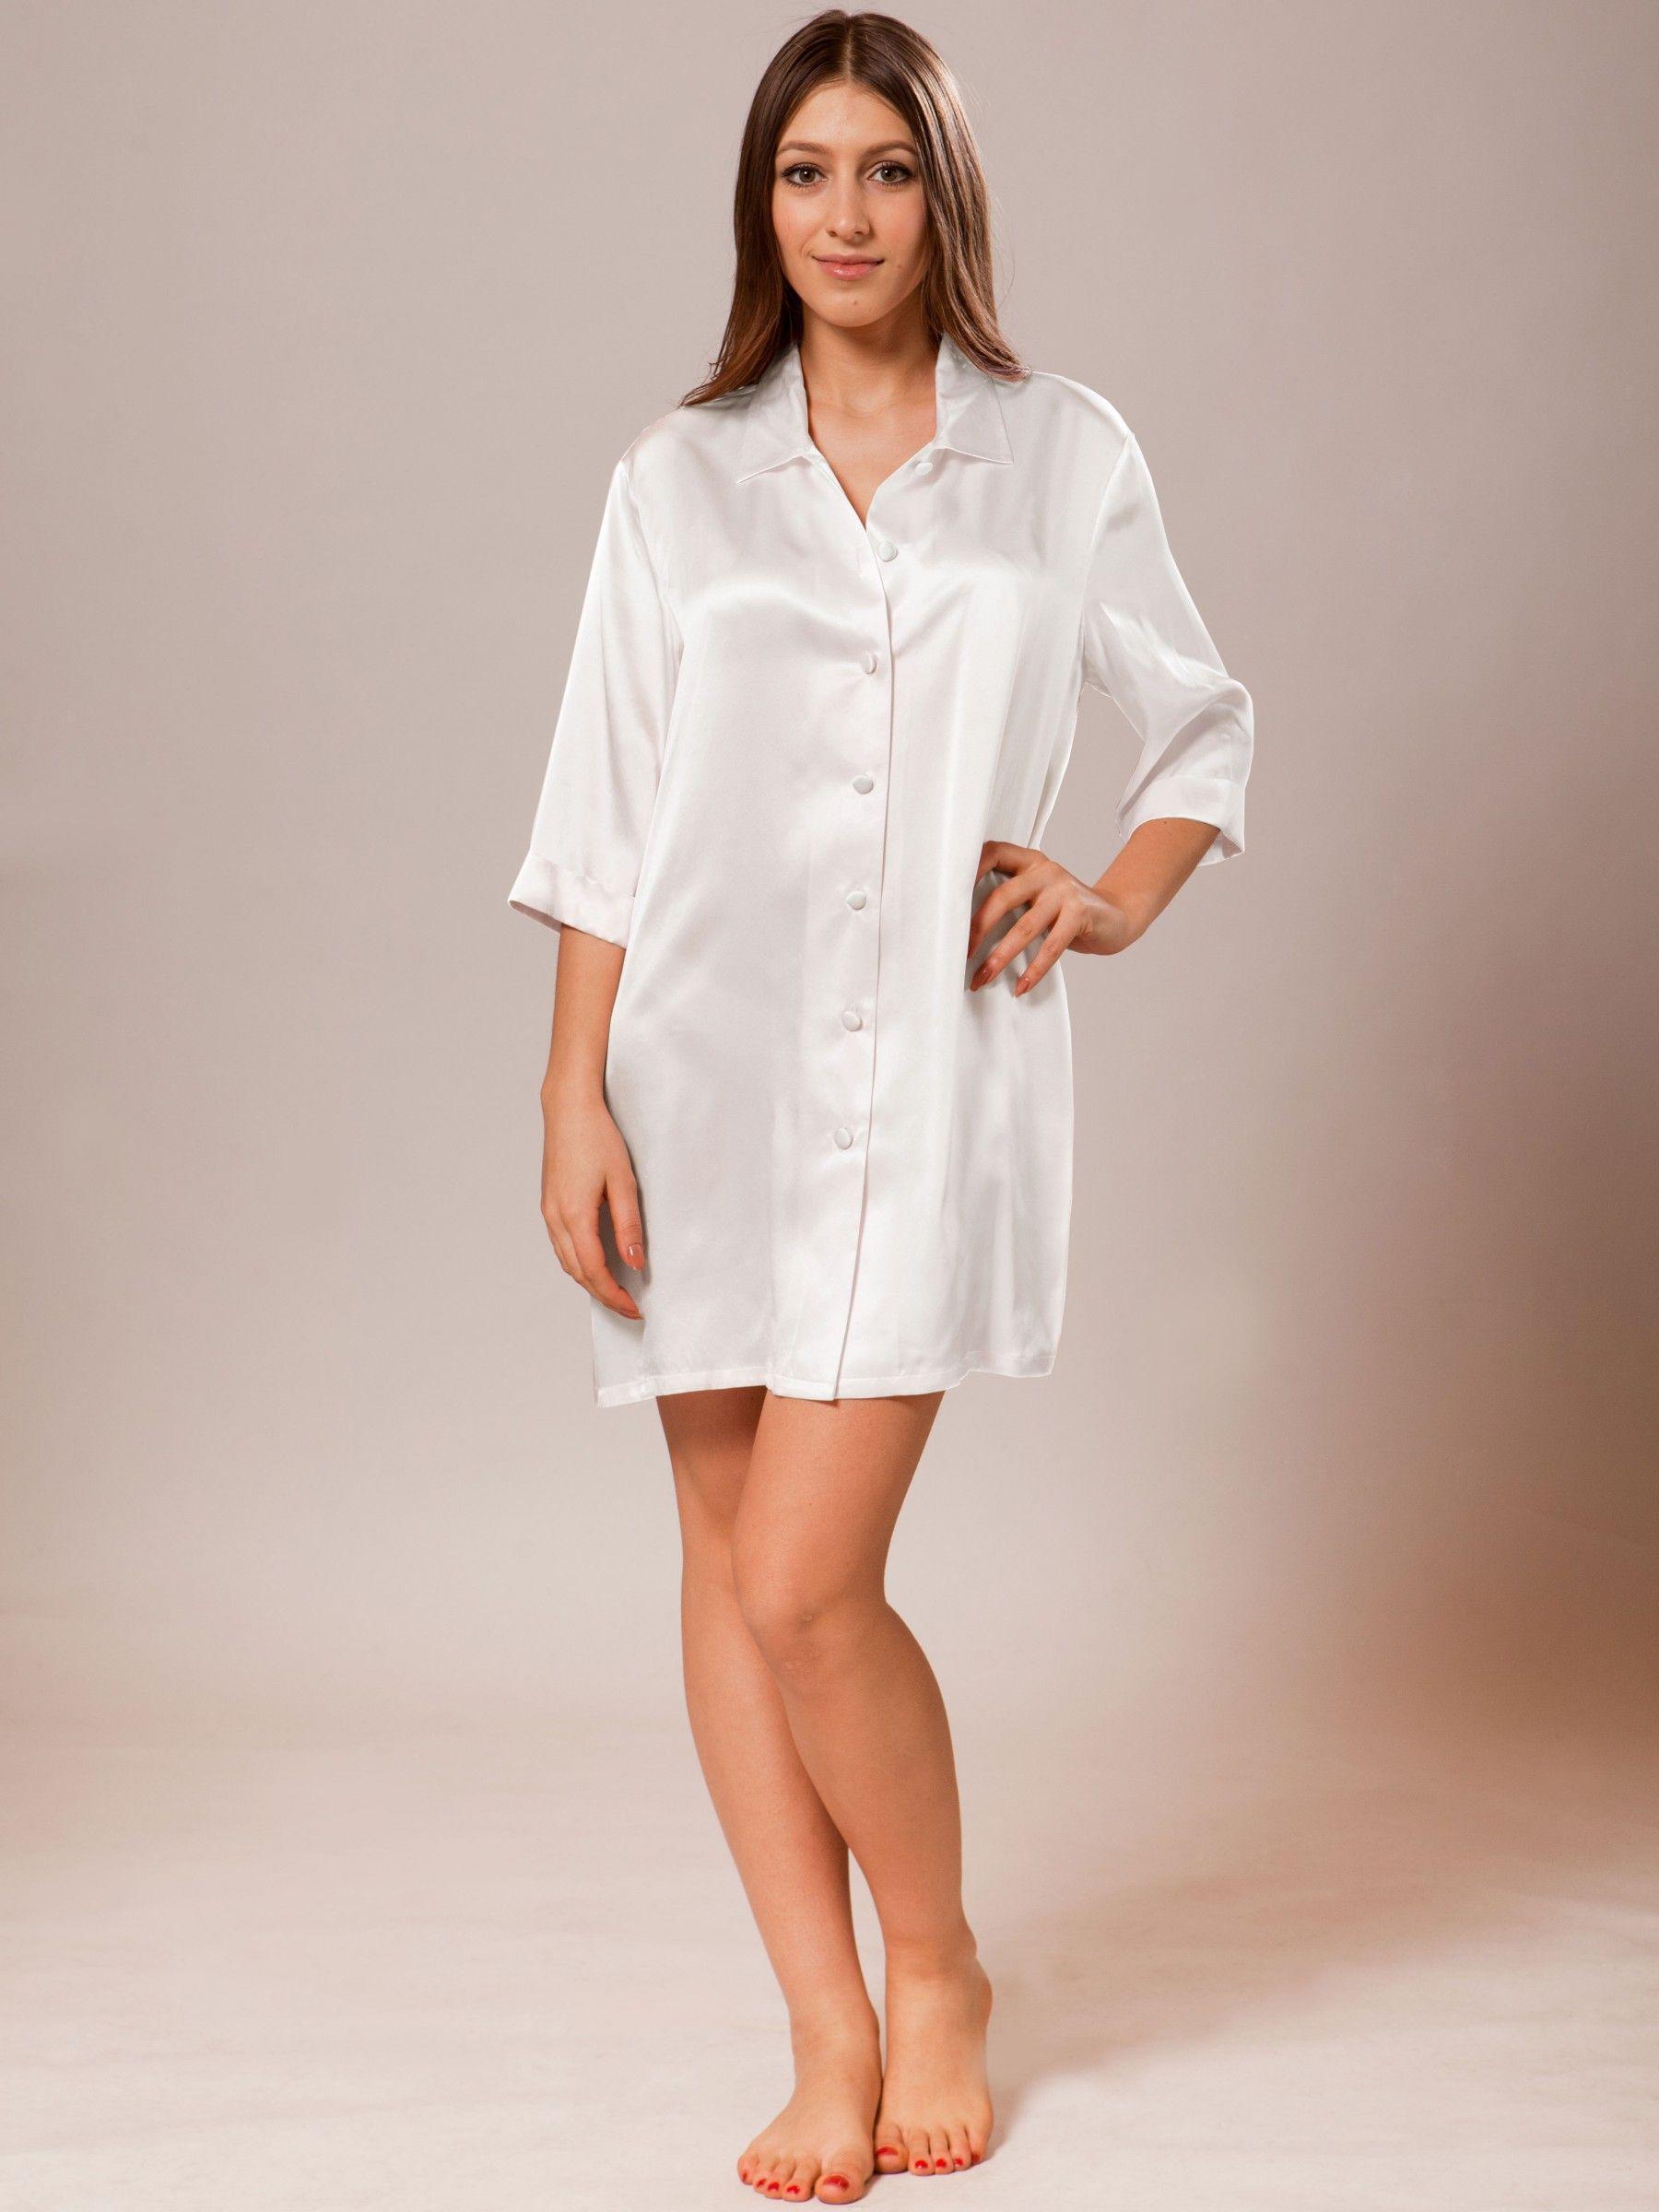 silk sleepshirt white. silk sleepshirt white Silk Pajamas 0efe1f8cc